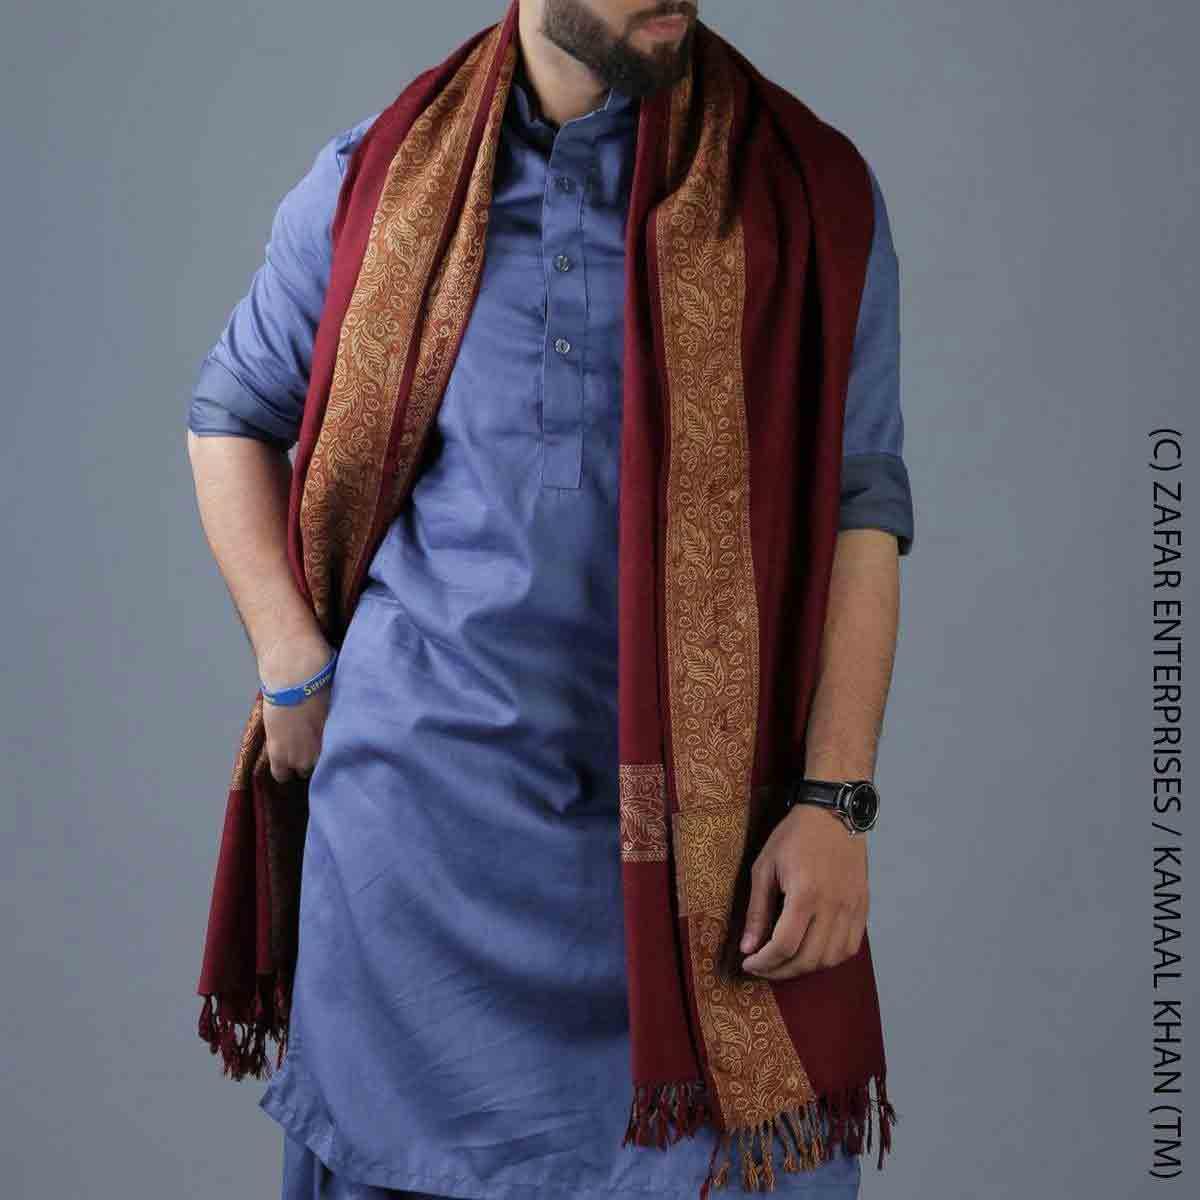 Maroon shawl designs for winter